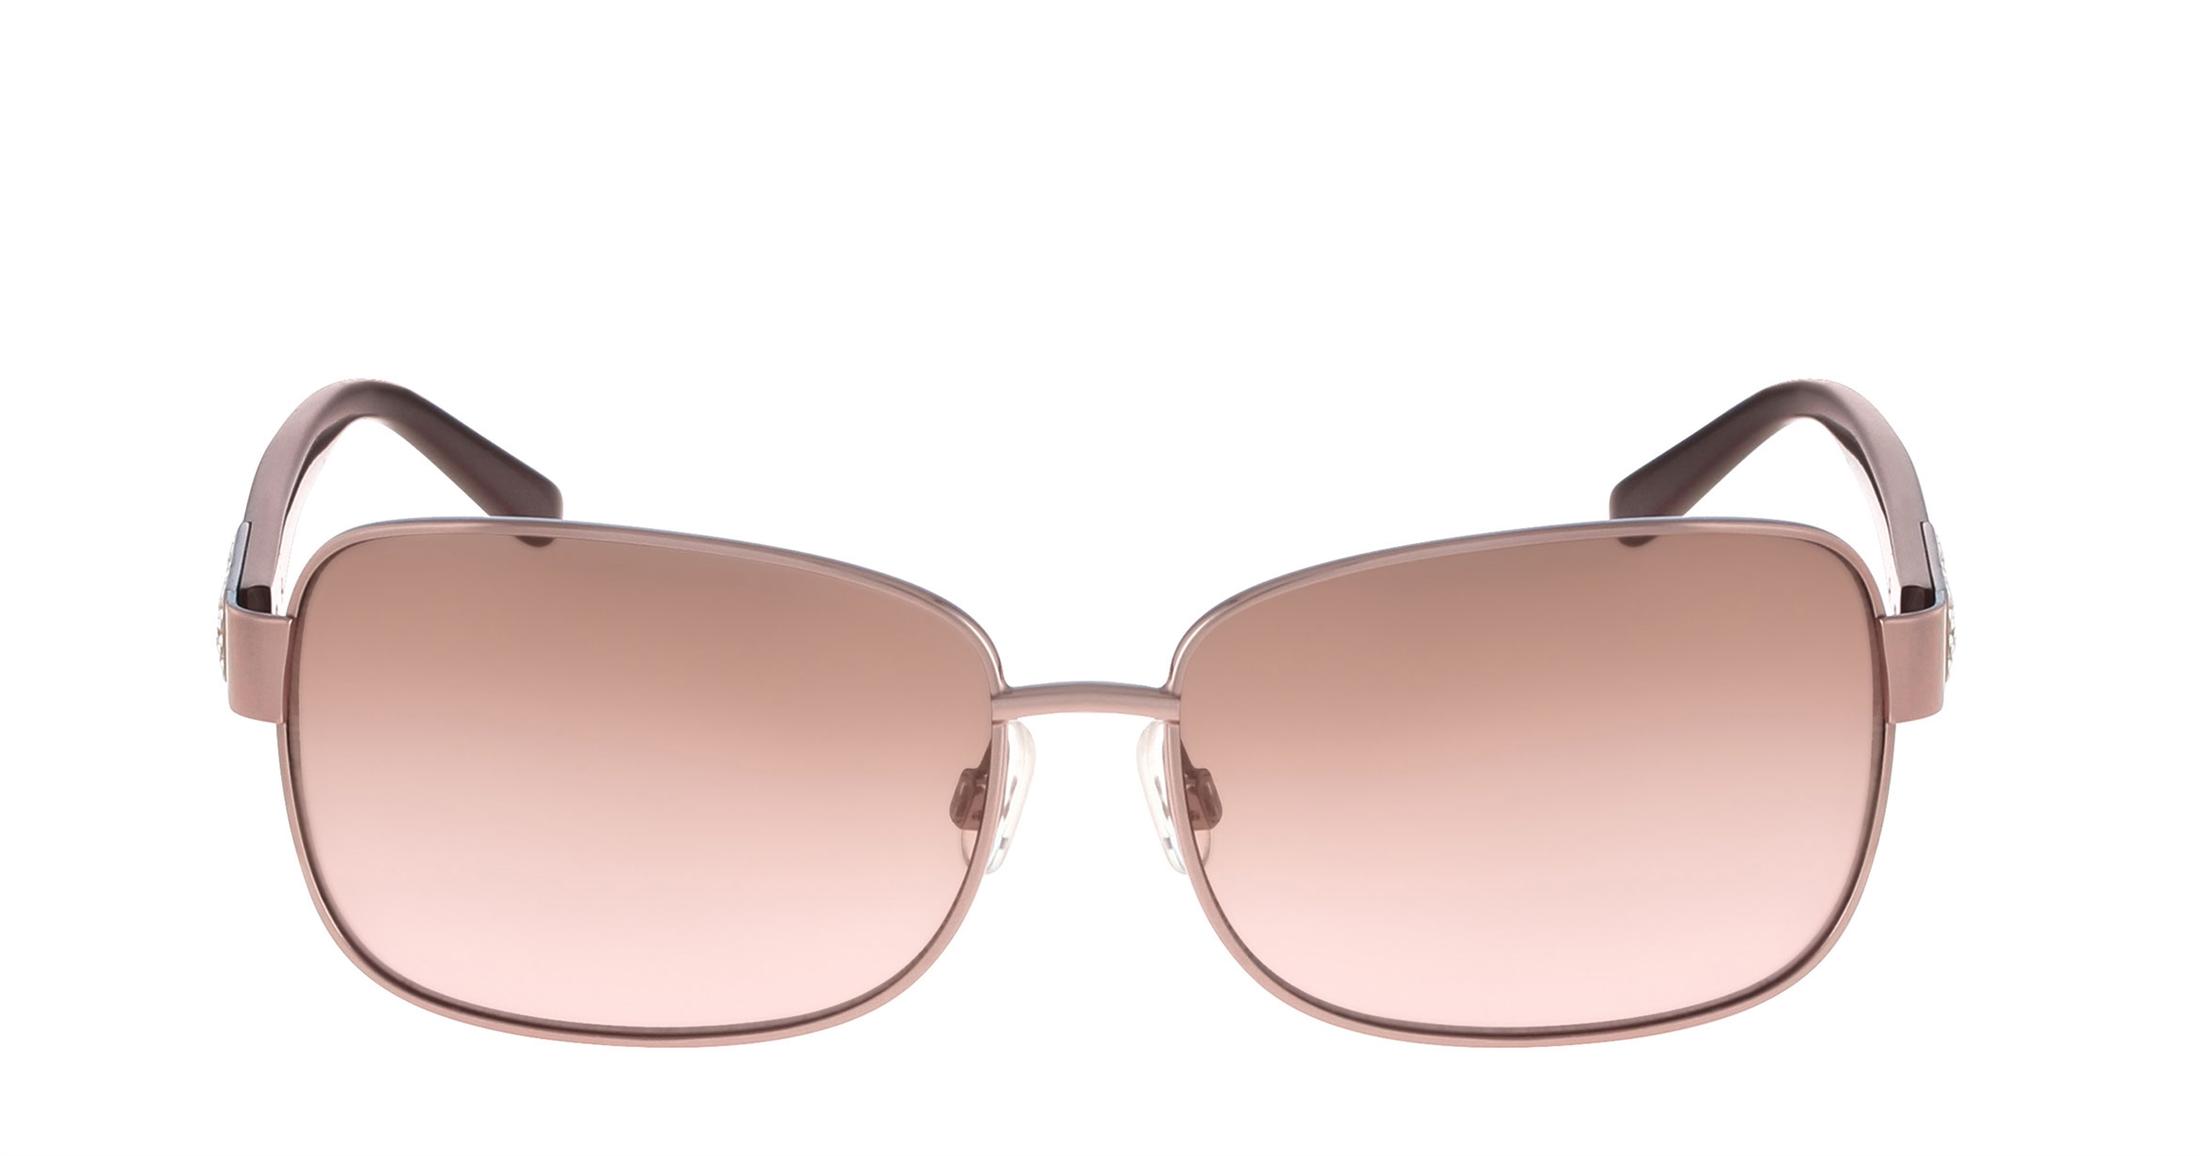 fadf0dbd1a Oakley Disclosure Sunglasses Rose Gold